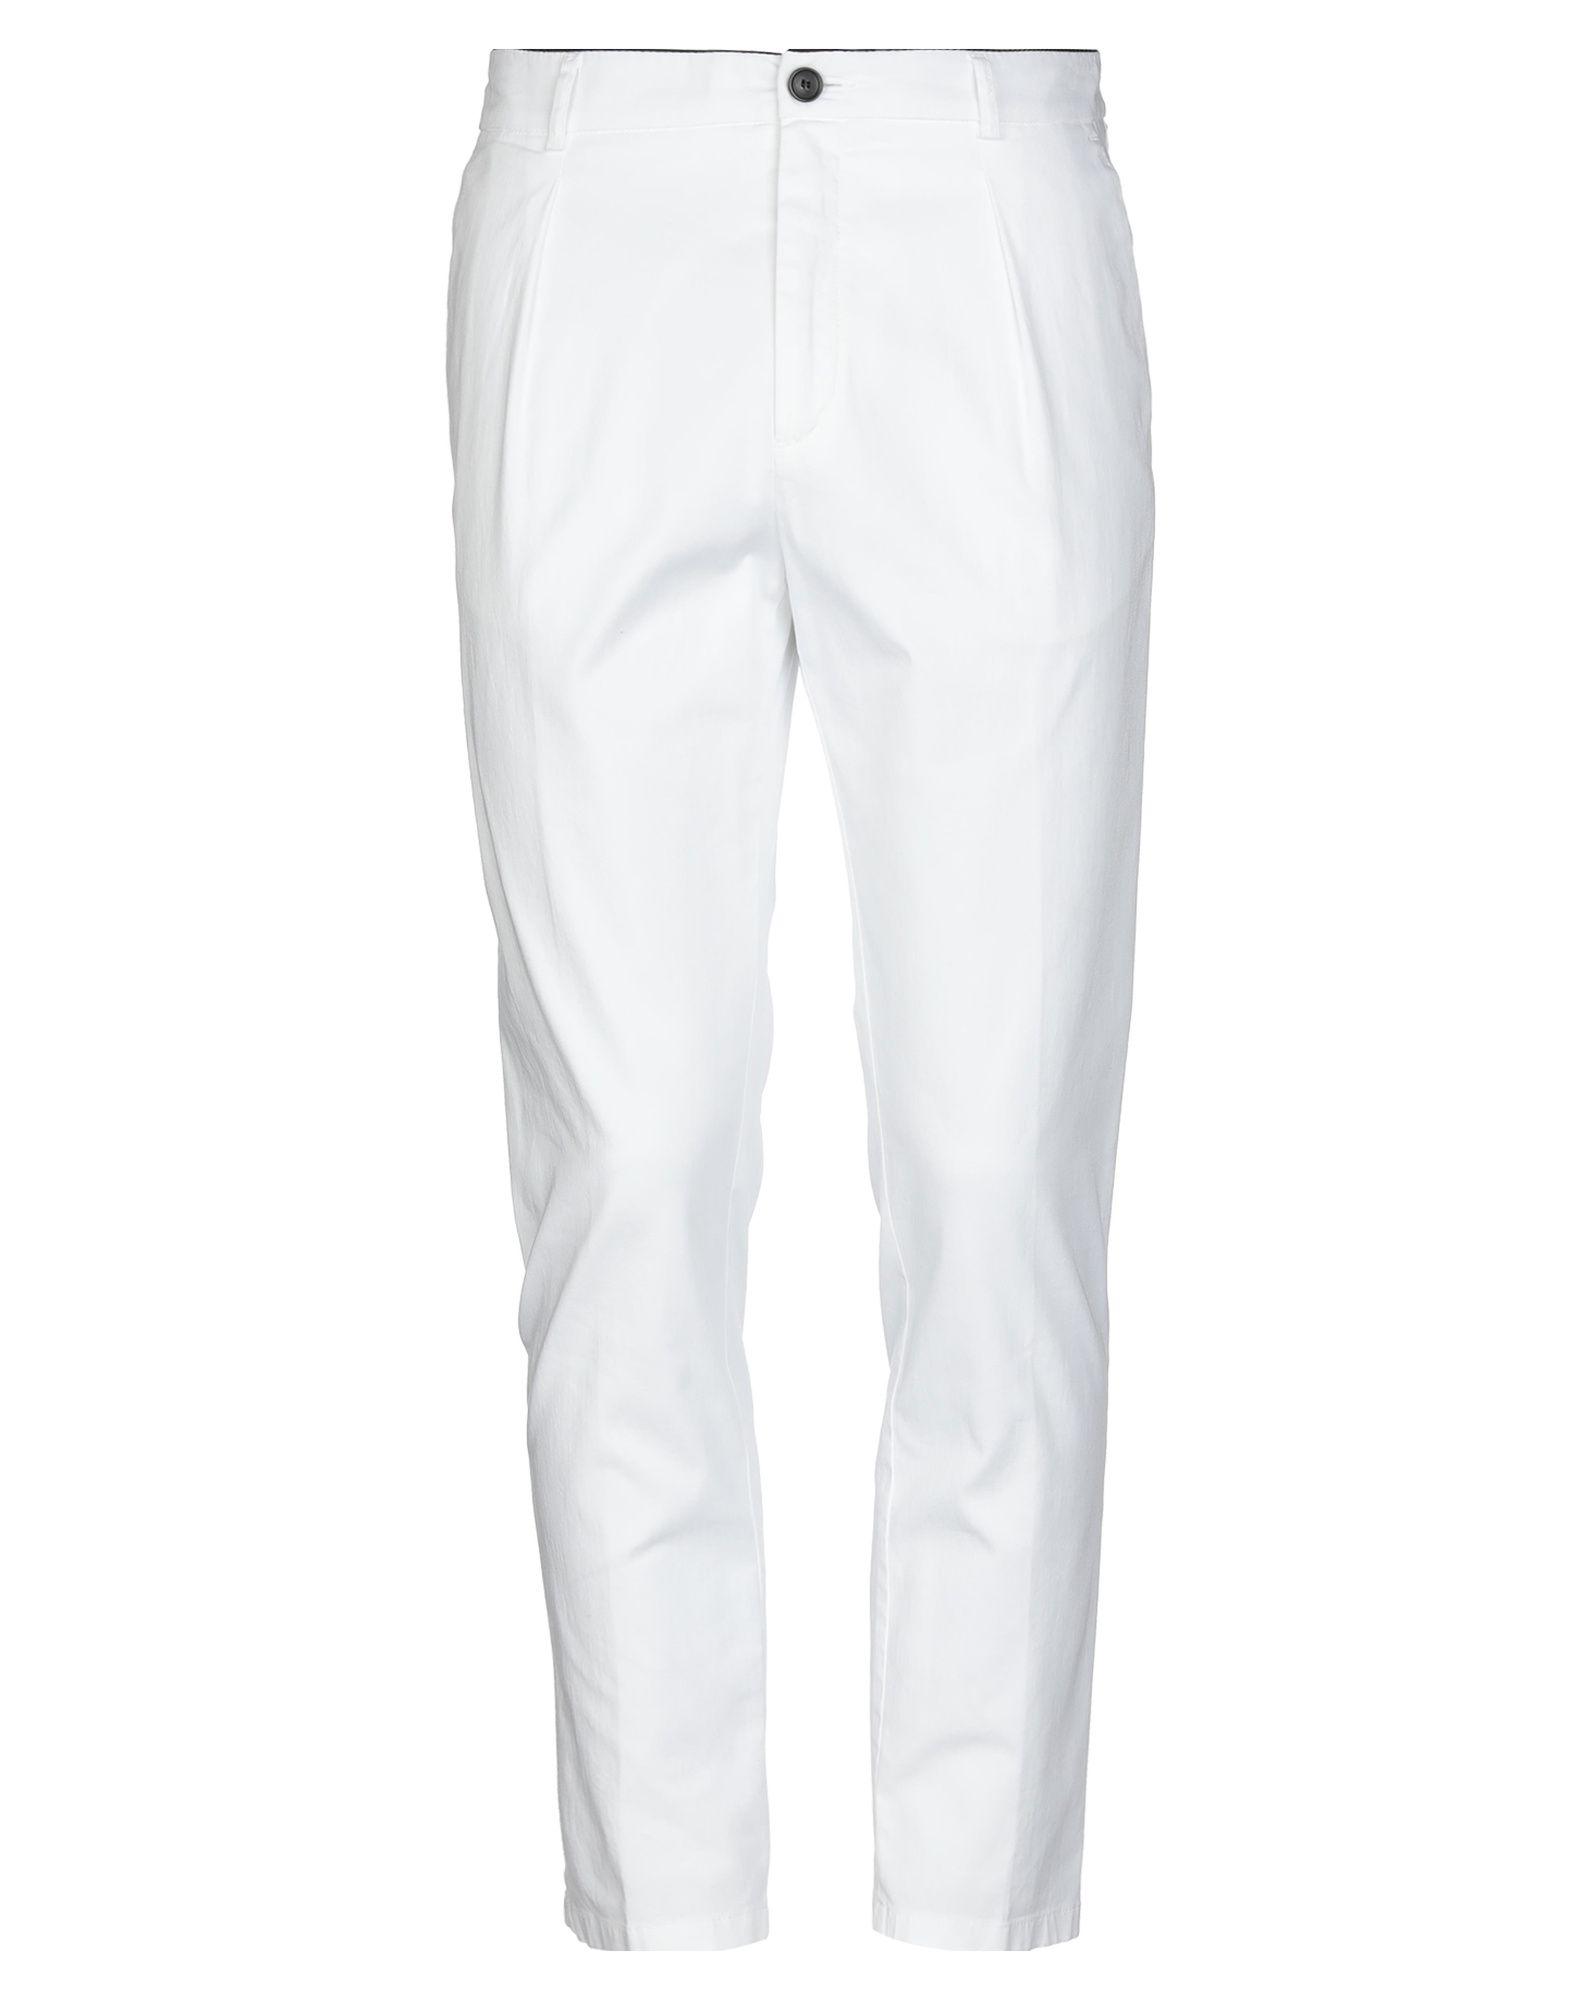 Pantalone Department 5 herren - 13286816TM